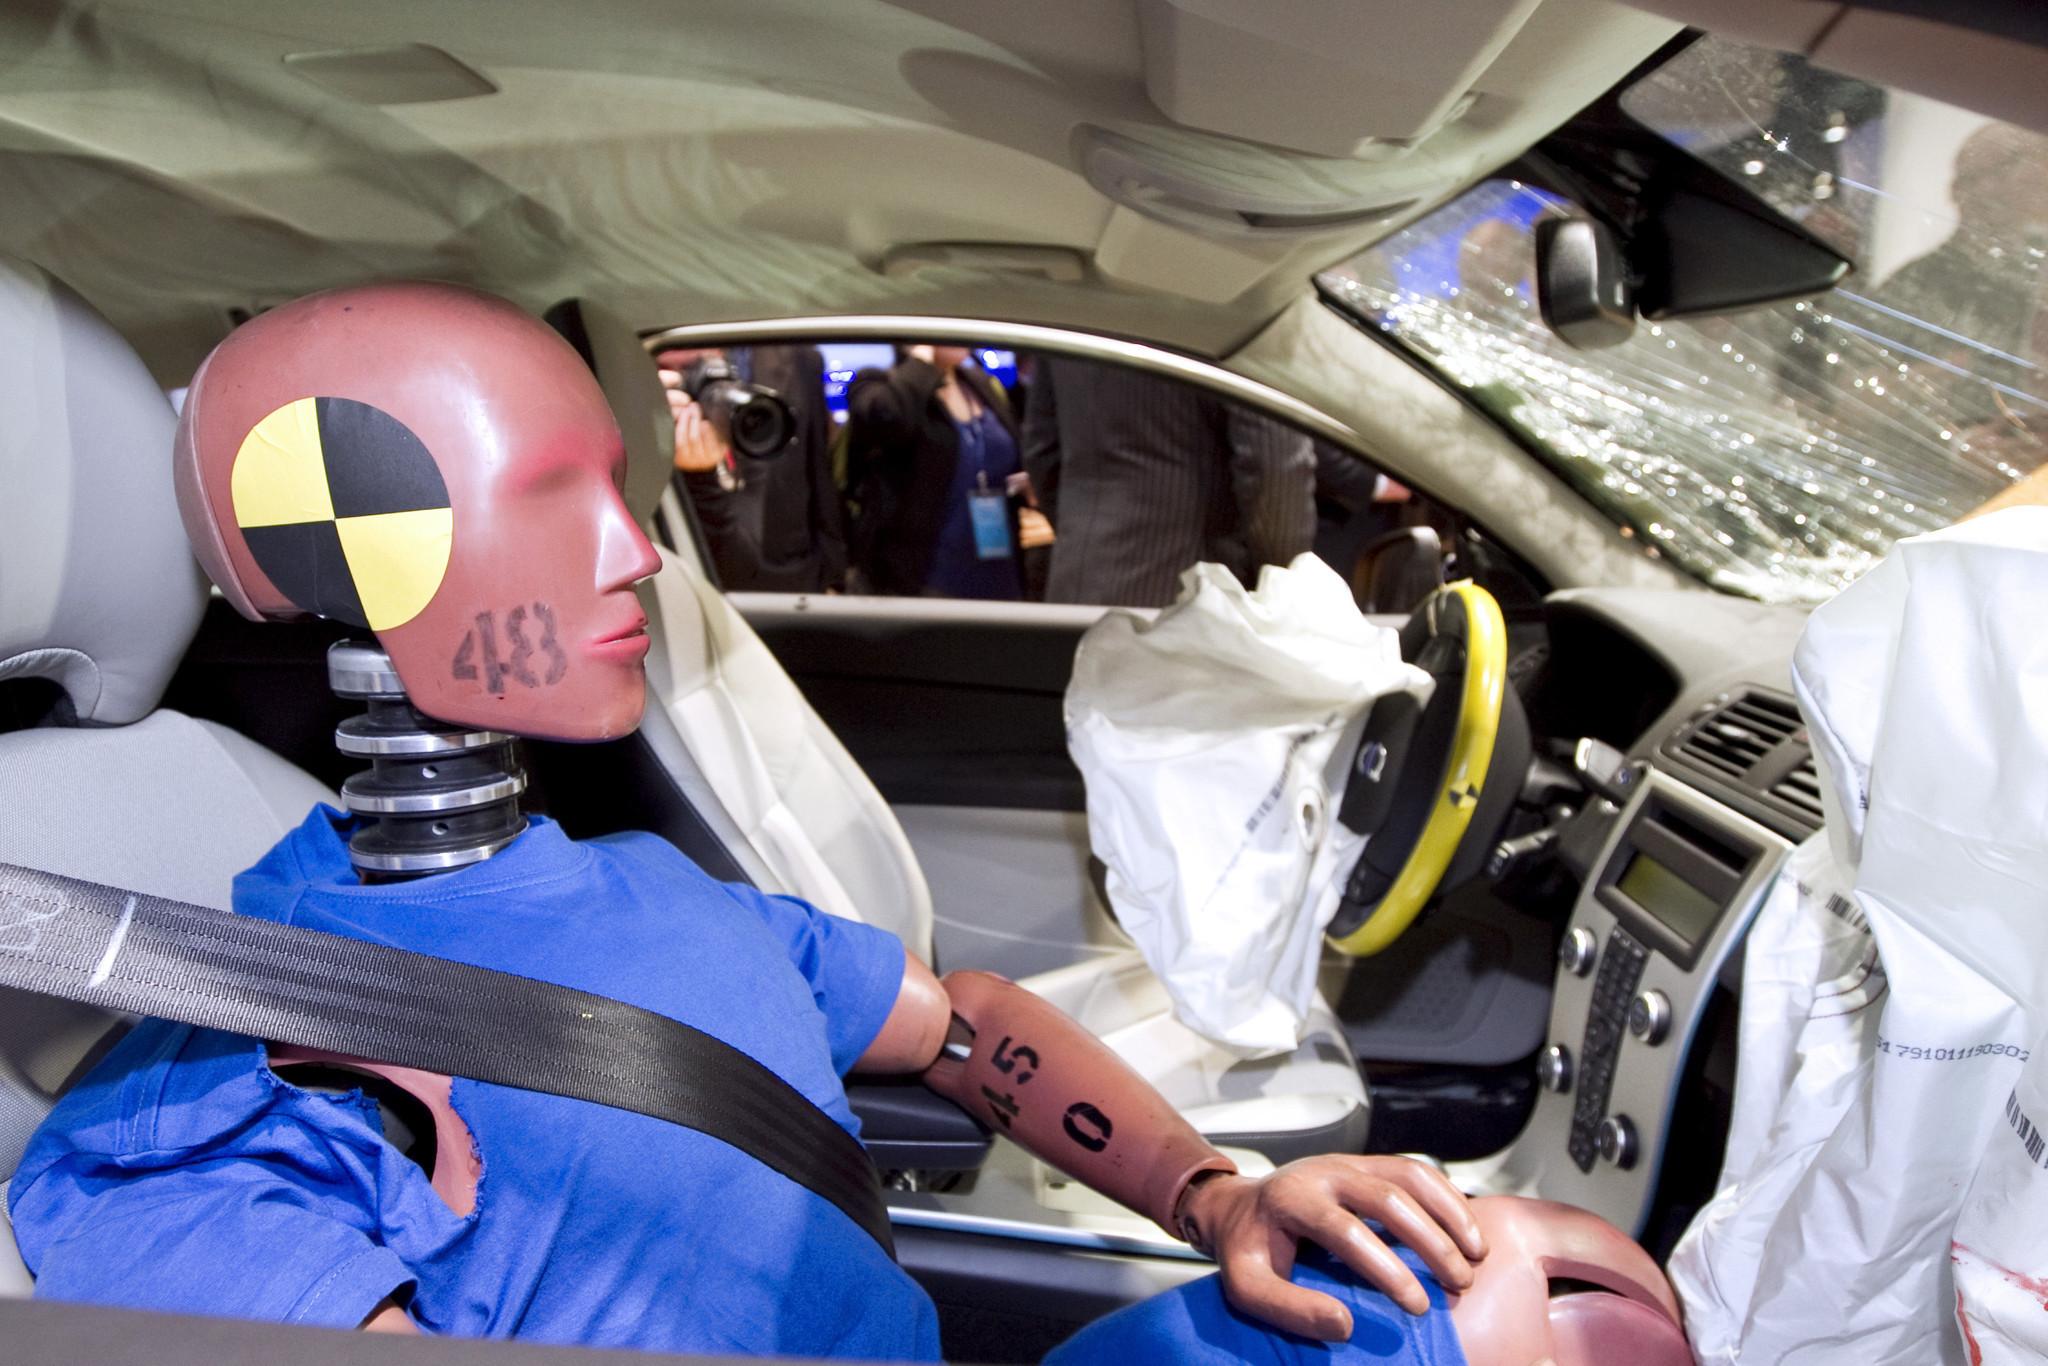 Crash-test dummies\' next test: The back seat - Chicago Tribune